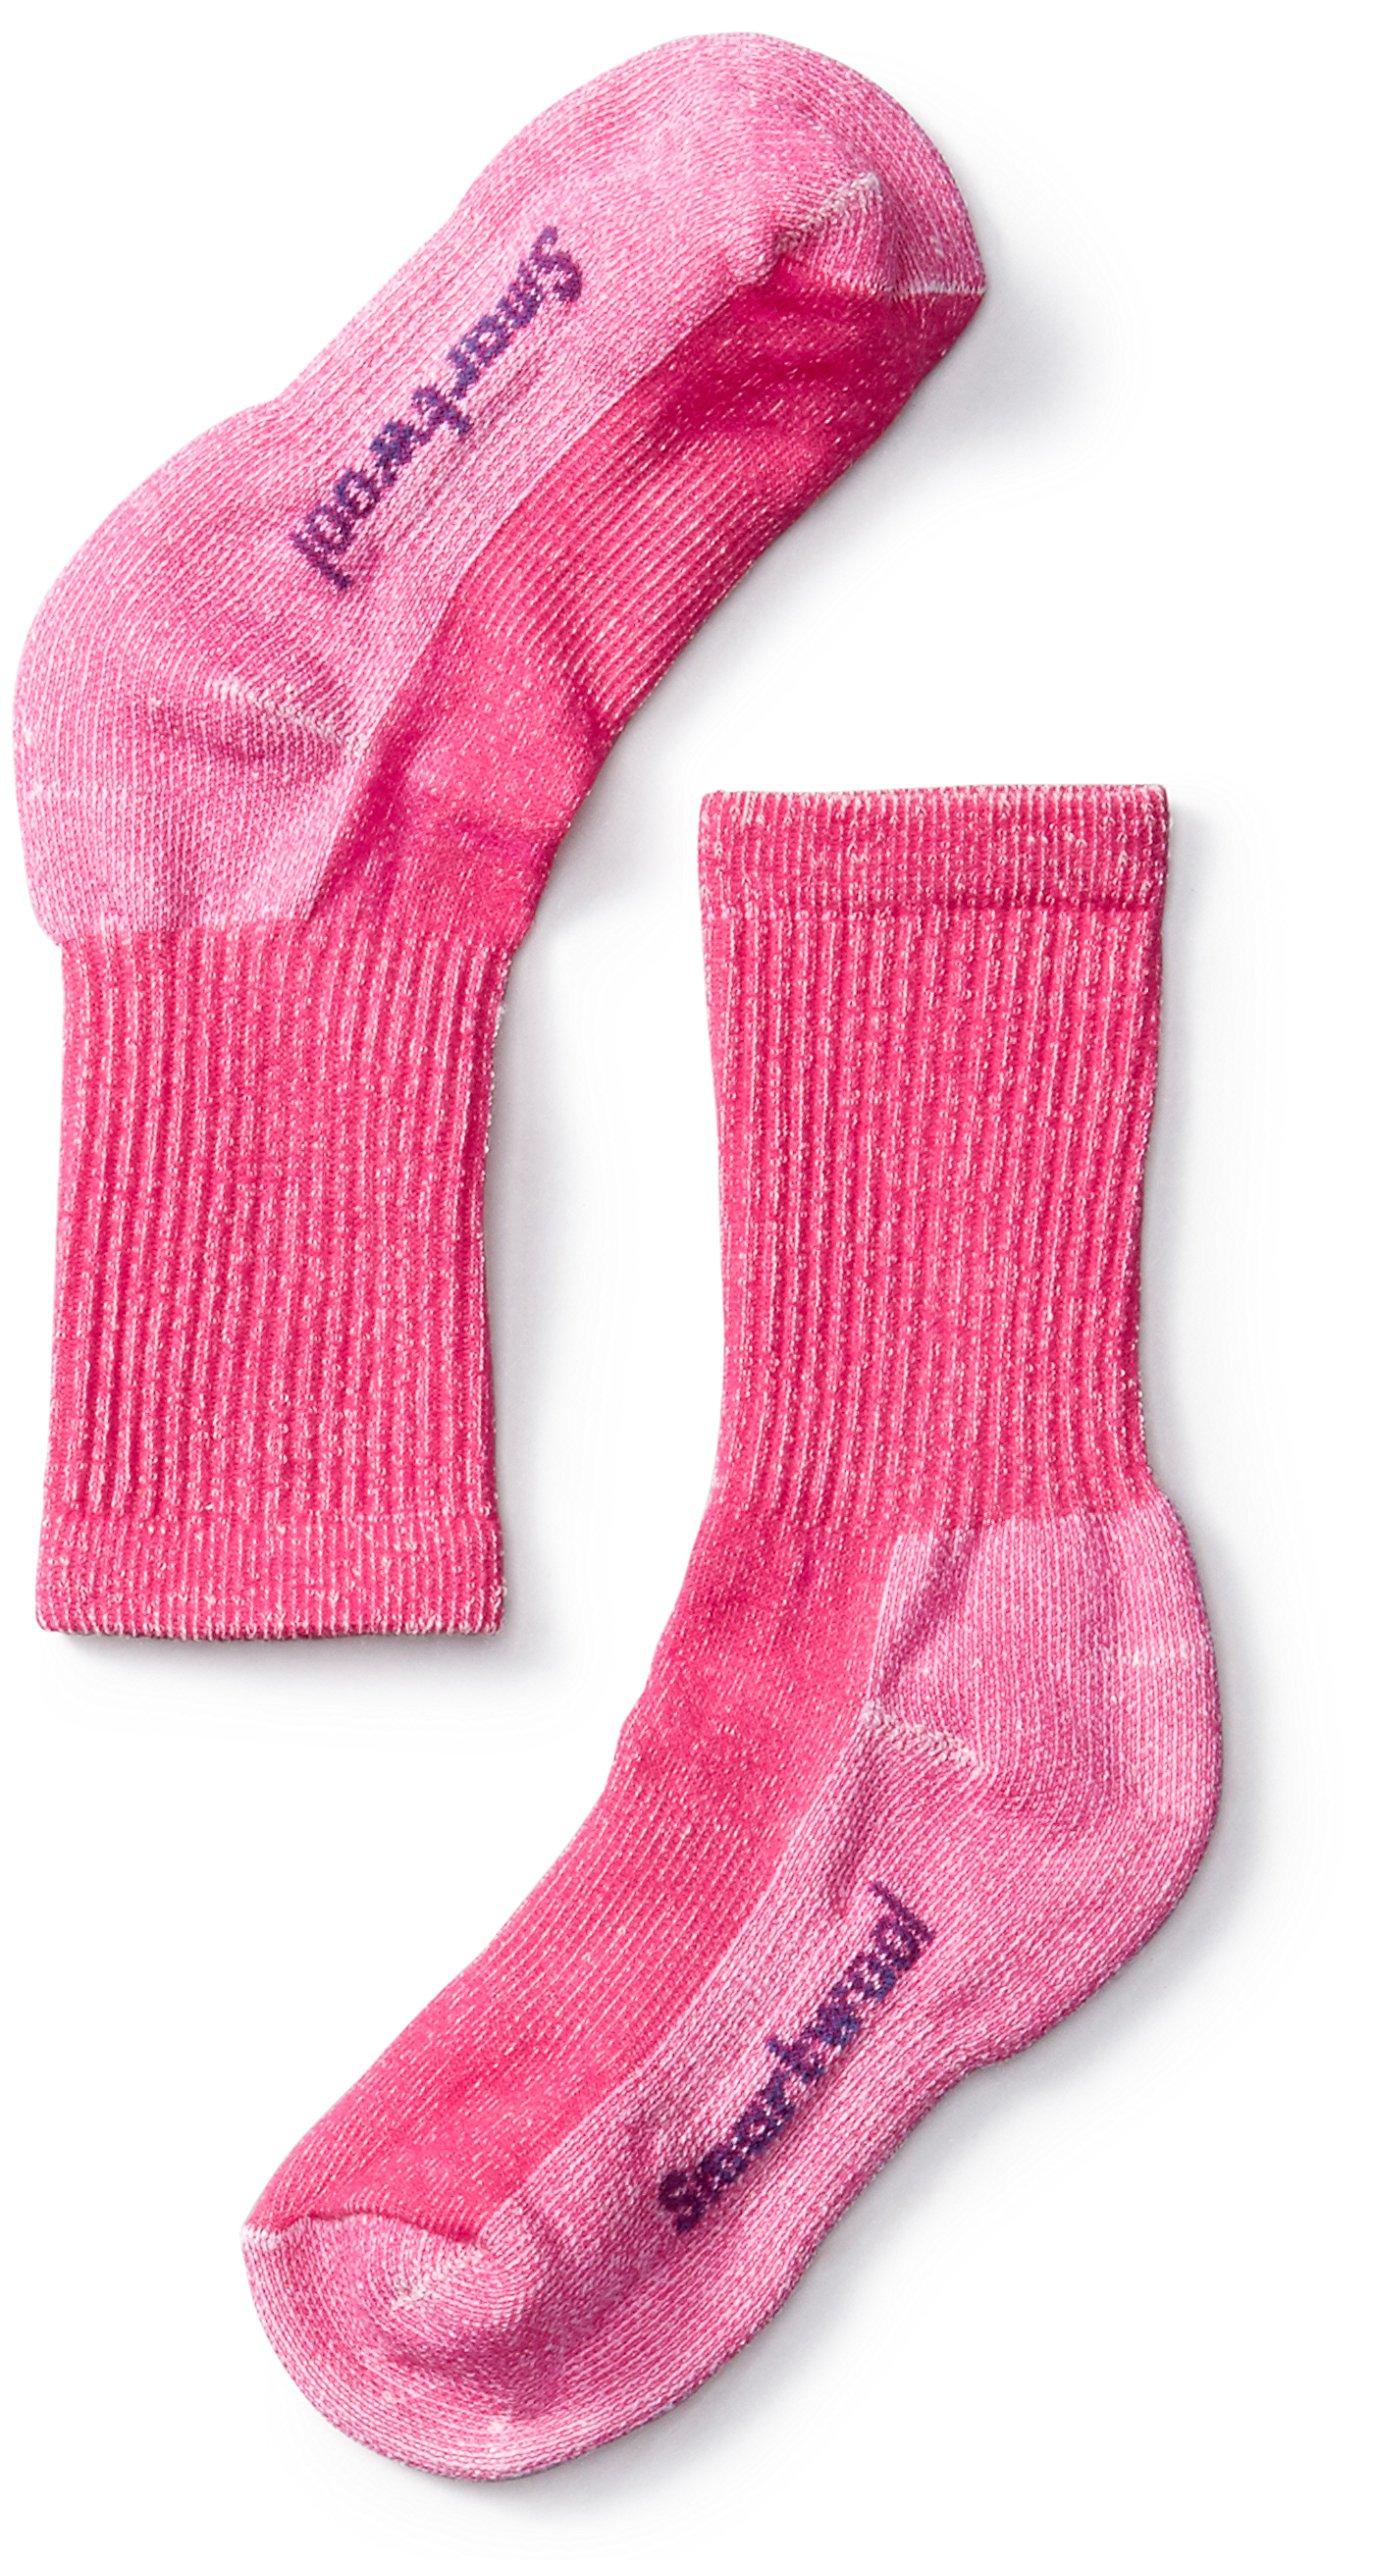 Smbx3|#Smartwool Kids Hike Light Crew Socks - Potion Pink, Large 1